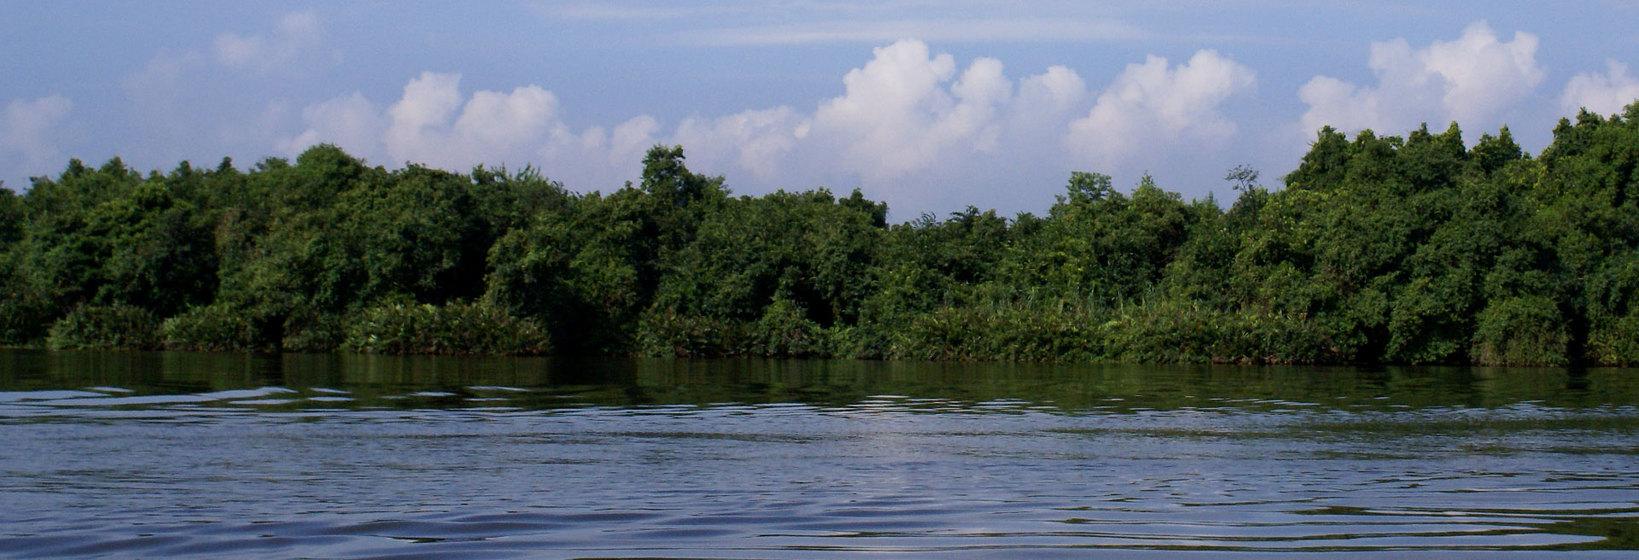 Muthurajawela Wetlands